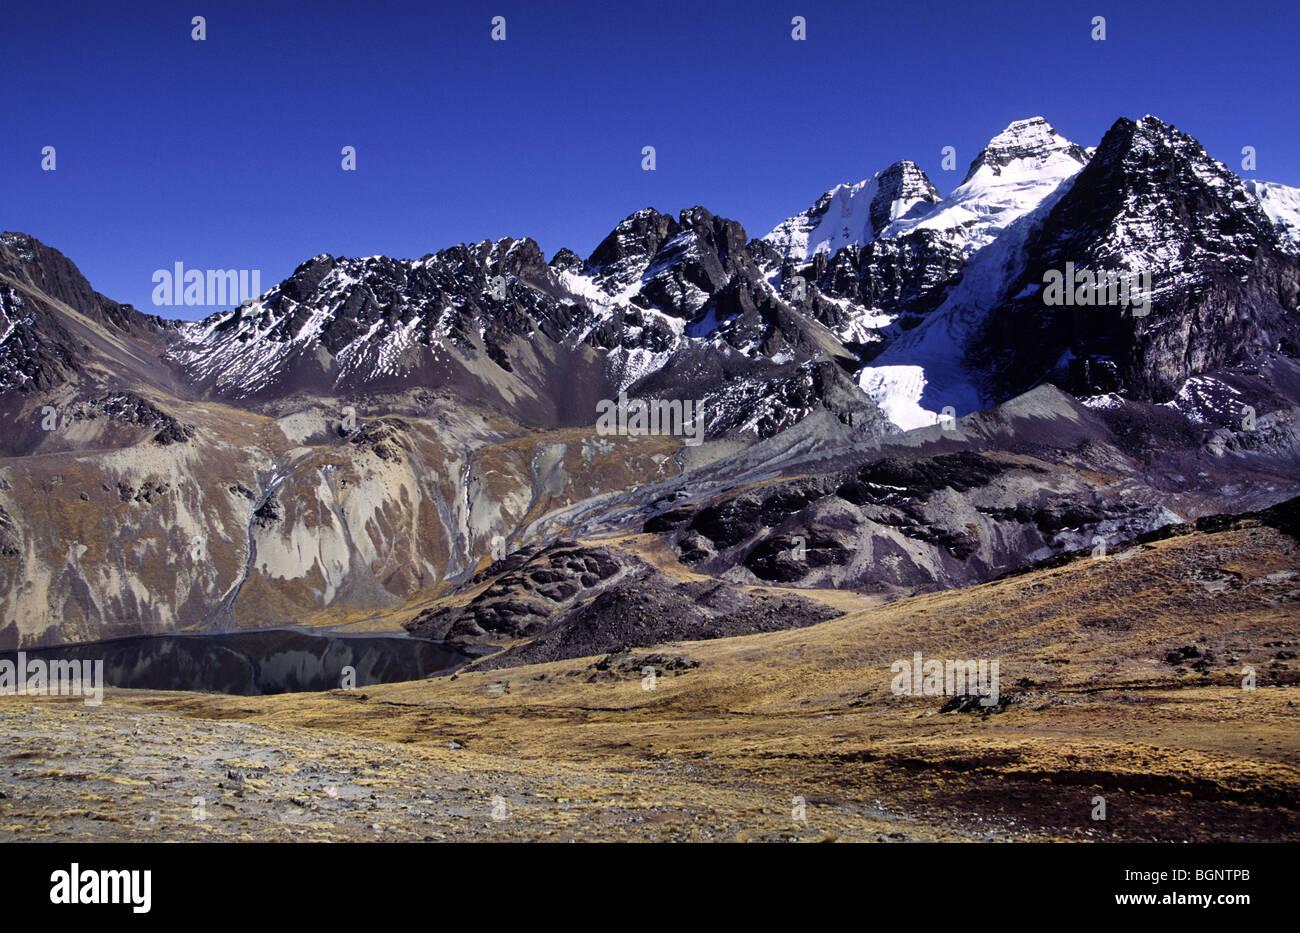 Condoriri mountains and lake Charkothia. Cordillera Real, Bolivia. - Stock Image